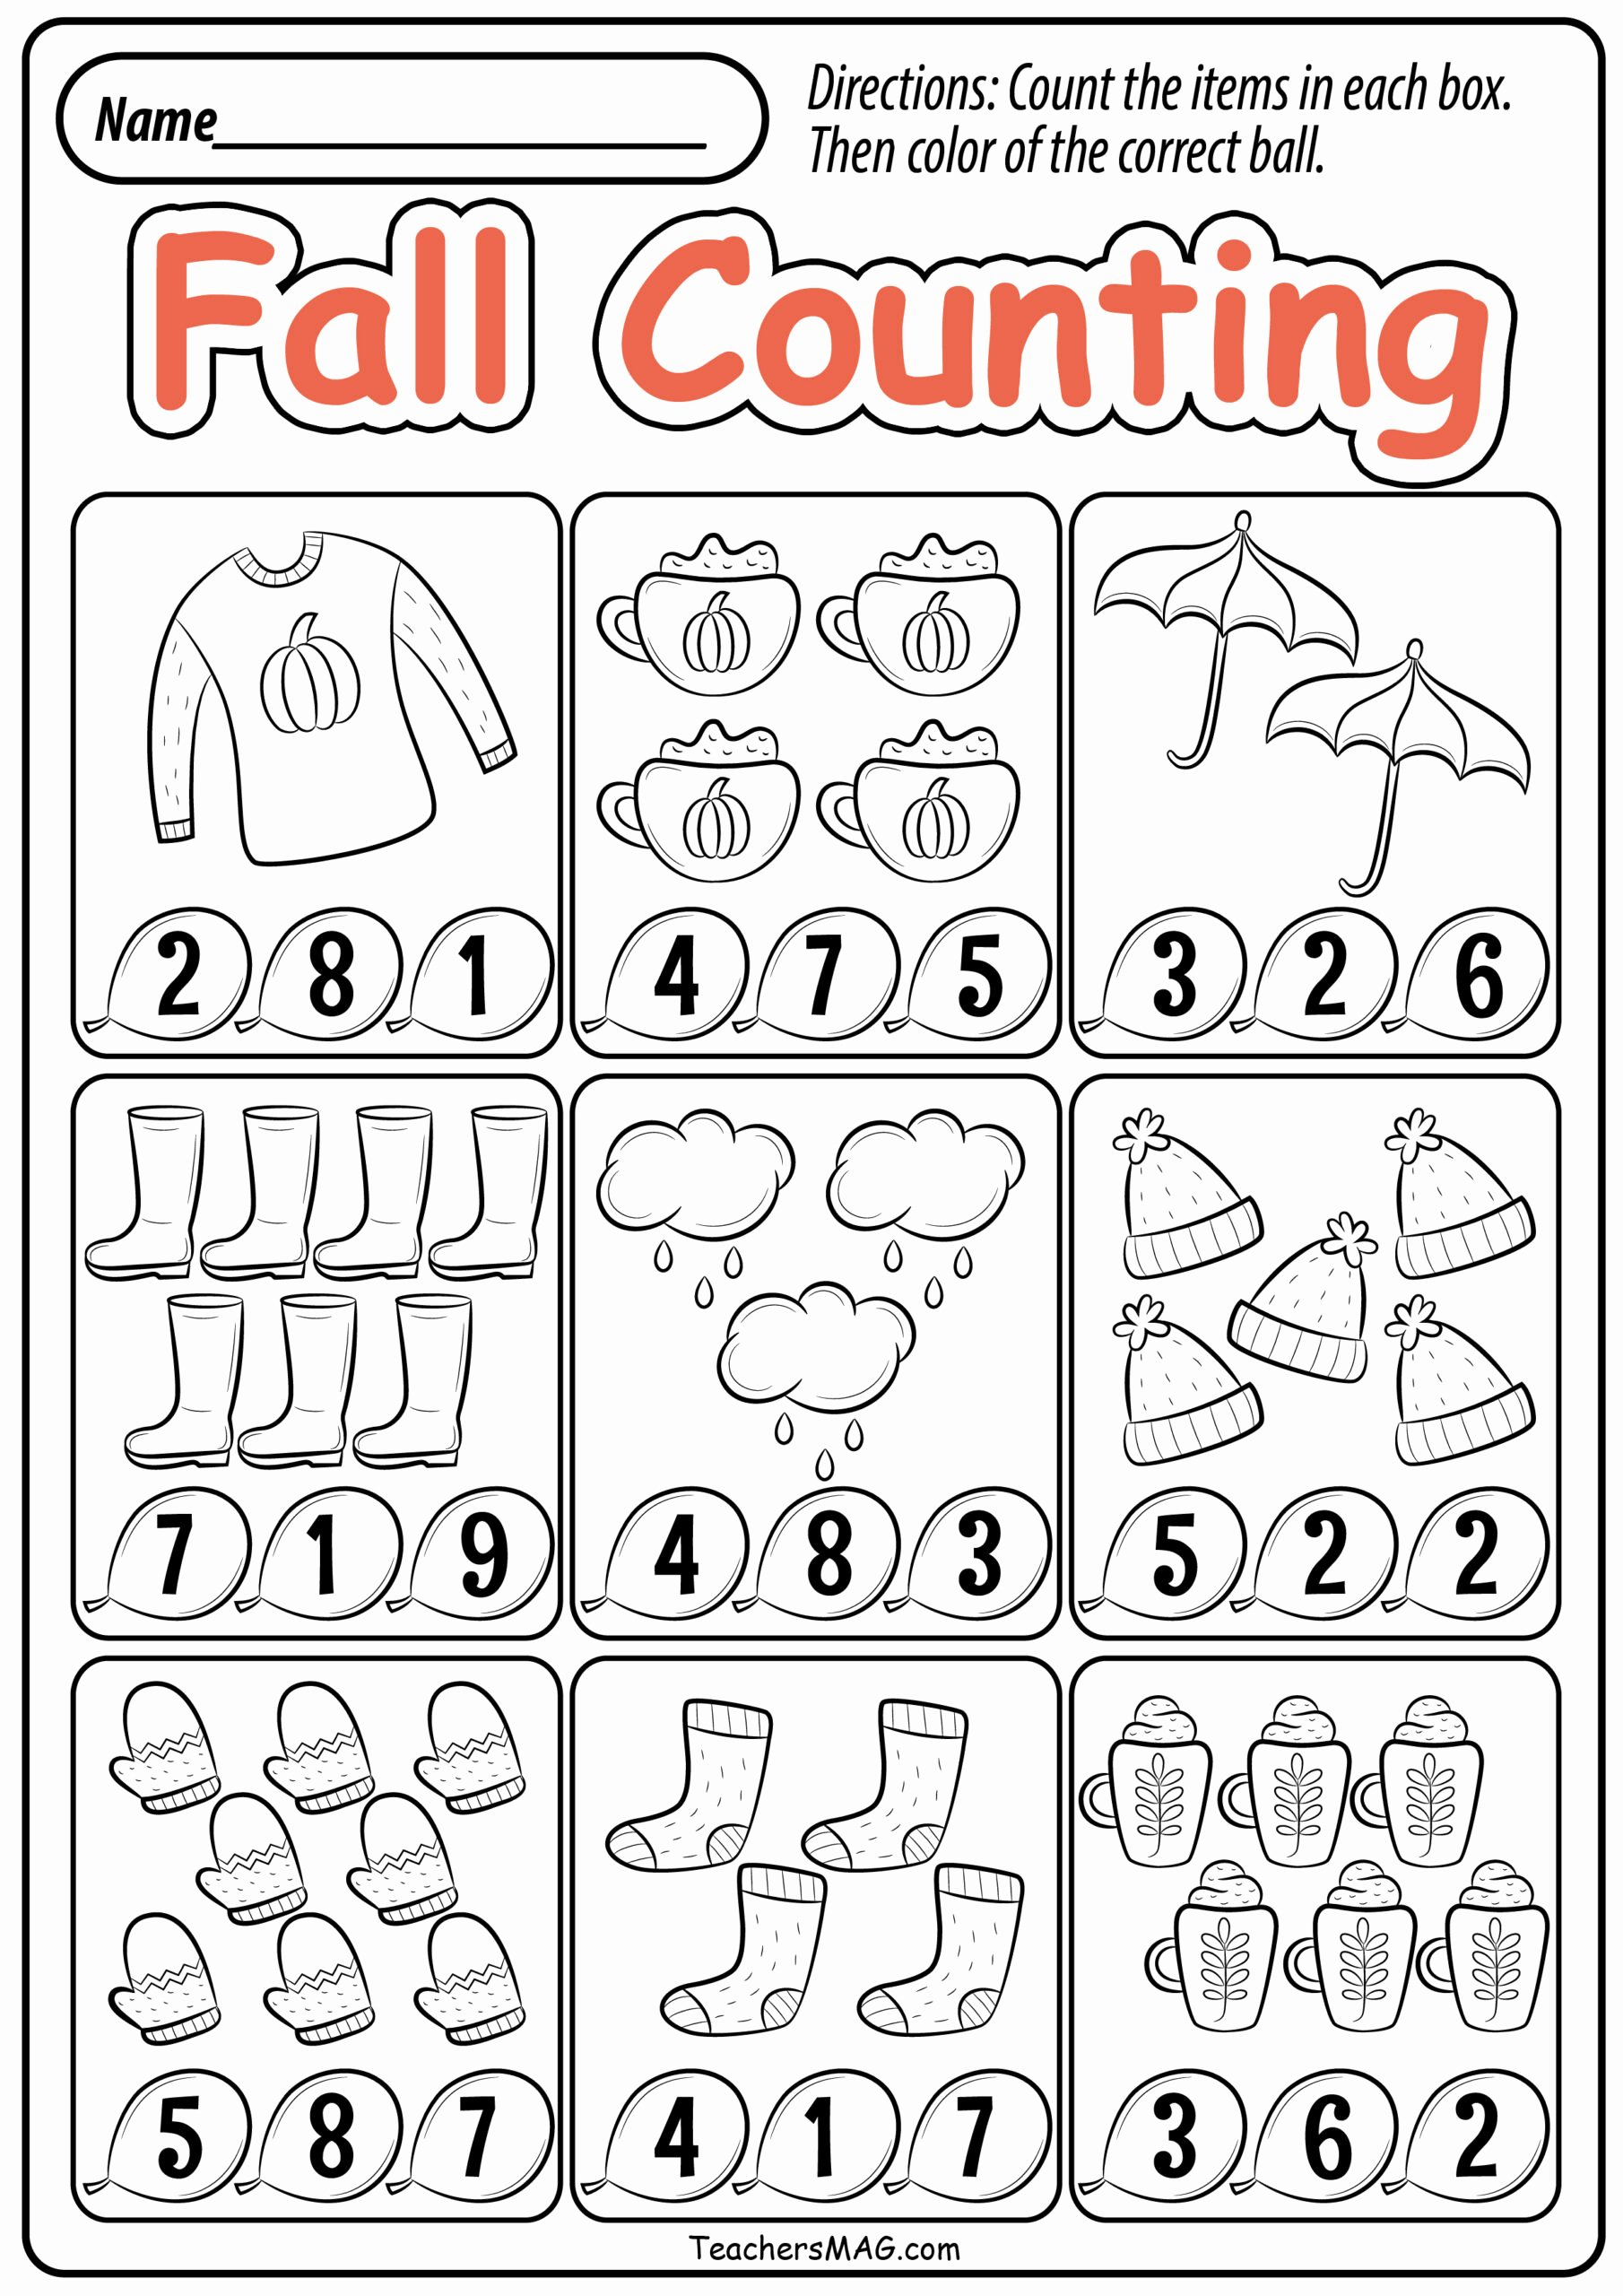 Free Printable Fall Worksheets for Preschoolers top Preschool Fall Math Worksheets Teachersmag Free Printable